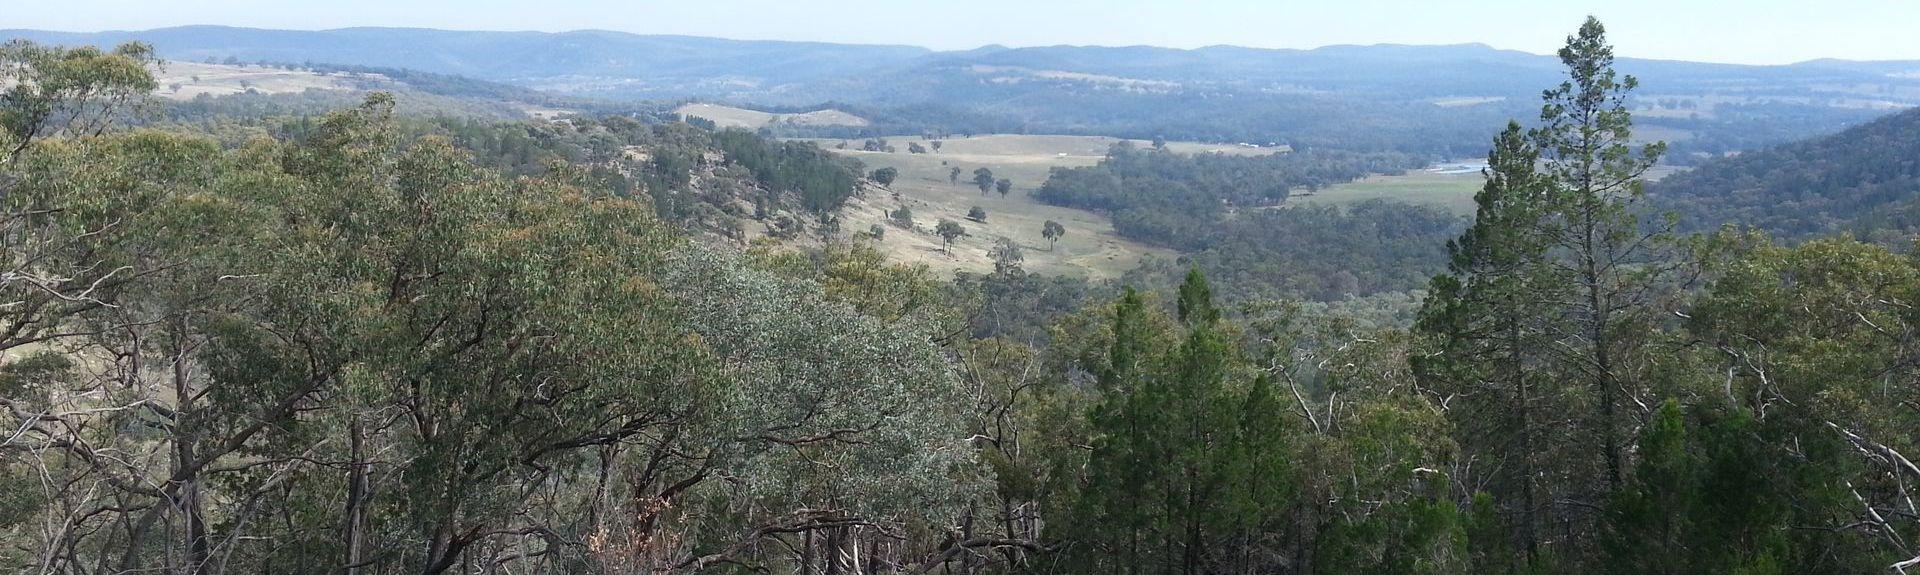 Wooragee, VIC, Australia